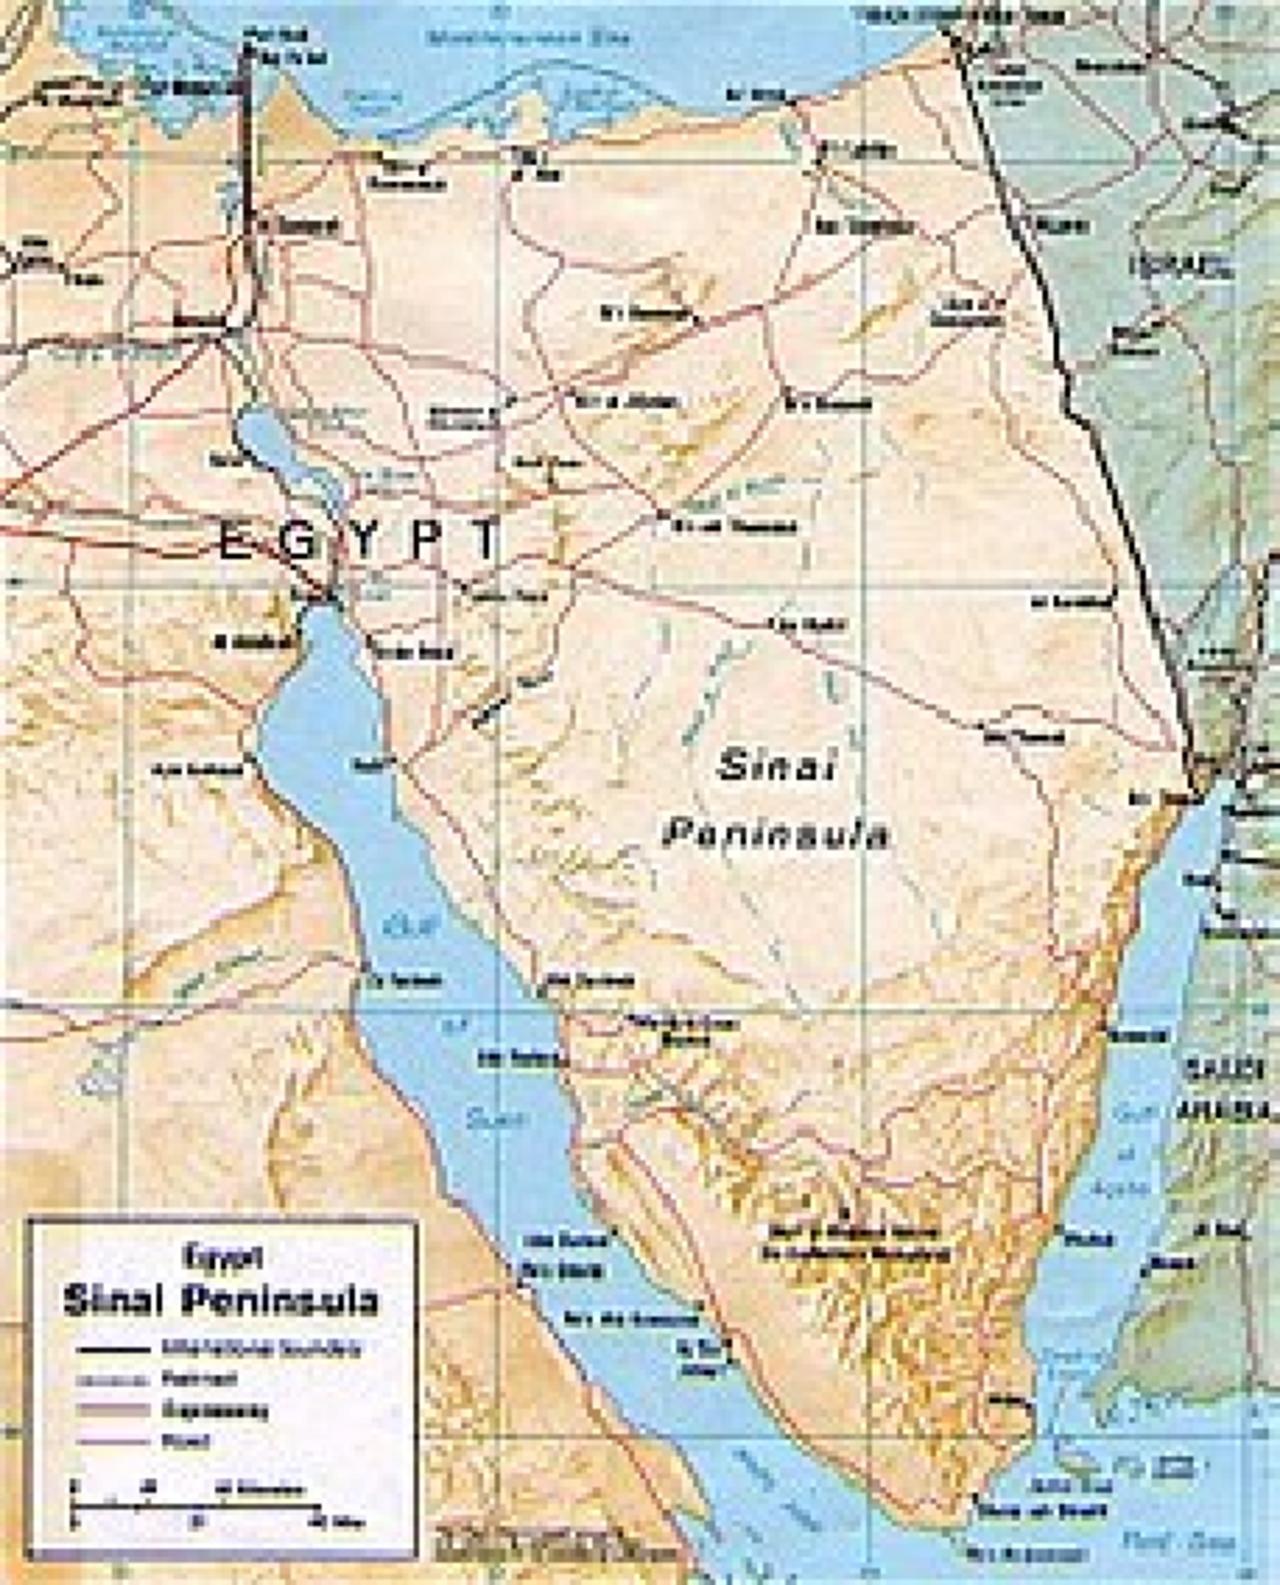 Cartina Egitto In Italiano.Cartina Fisica Egitto Docsity